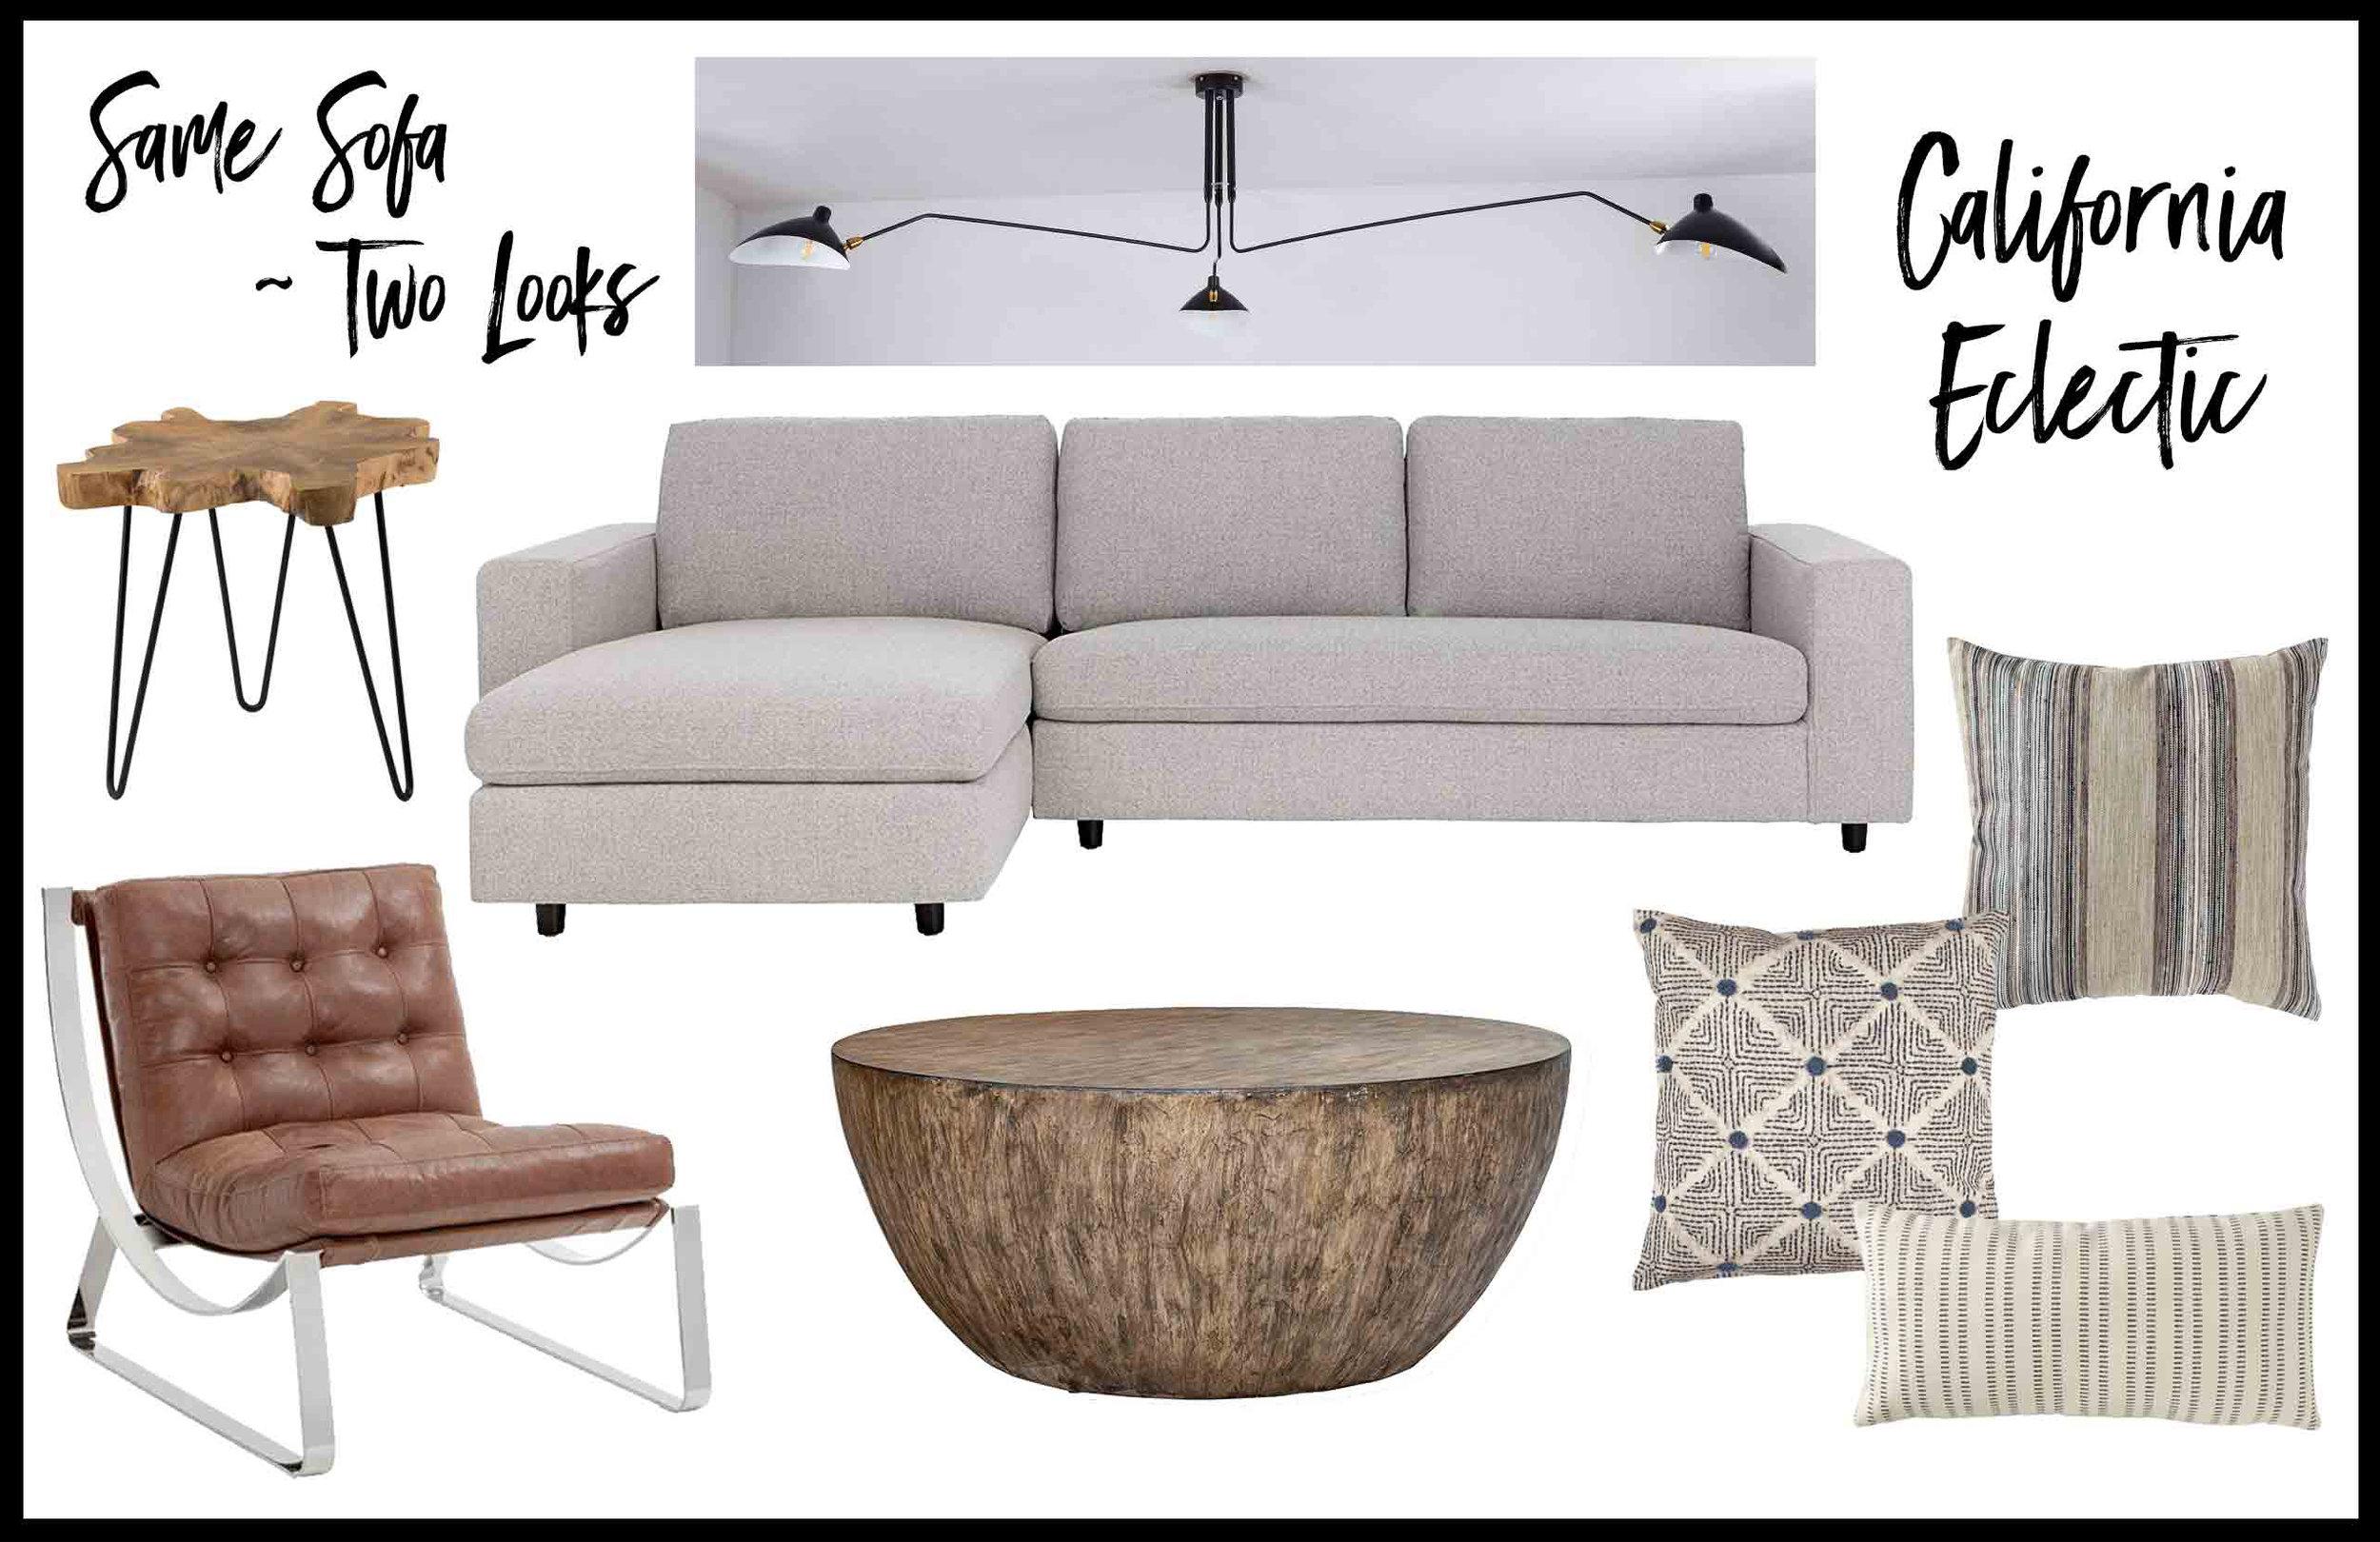 Same-Sofa-Two-Looks-Cali-Eclectic.jpg